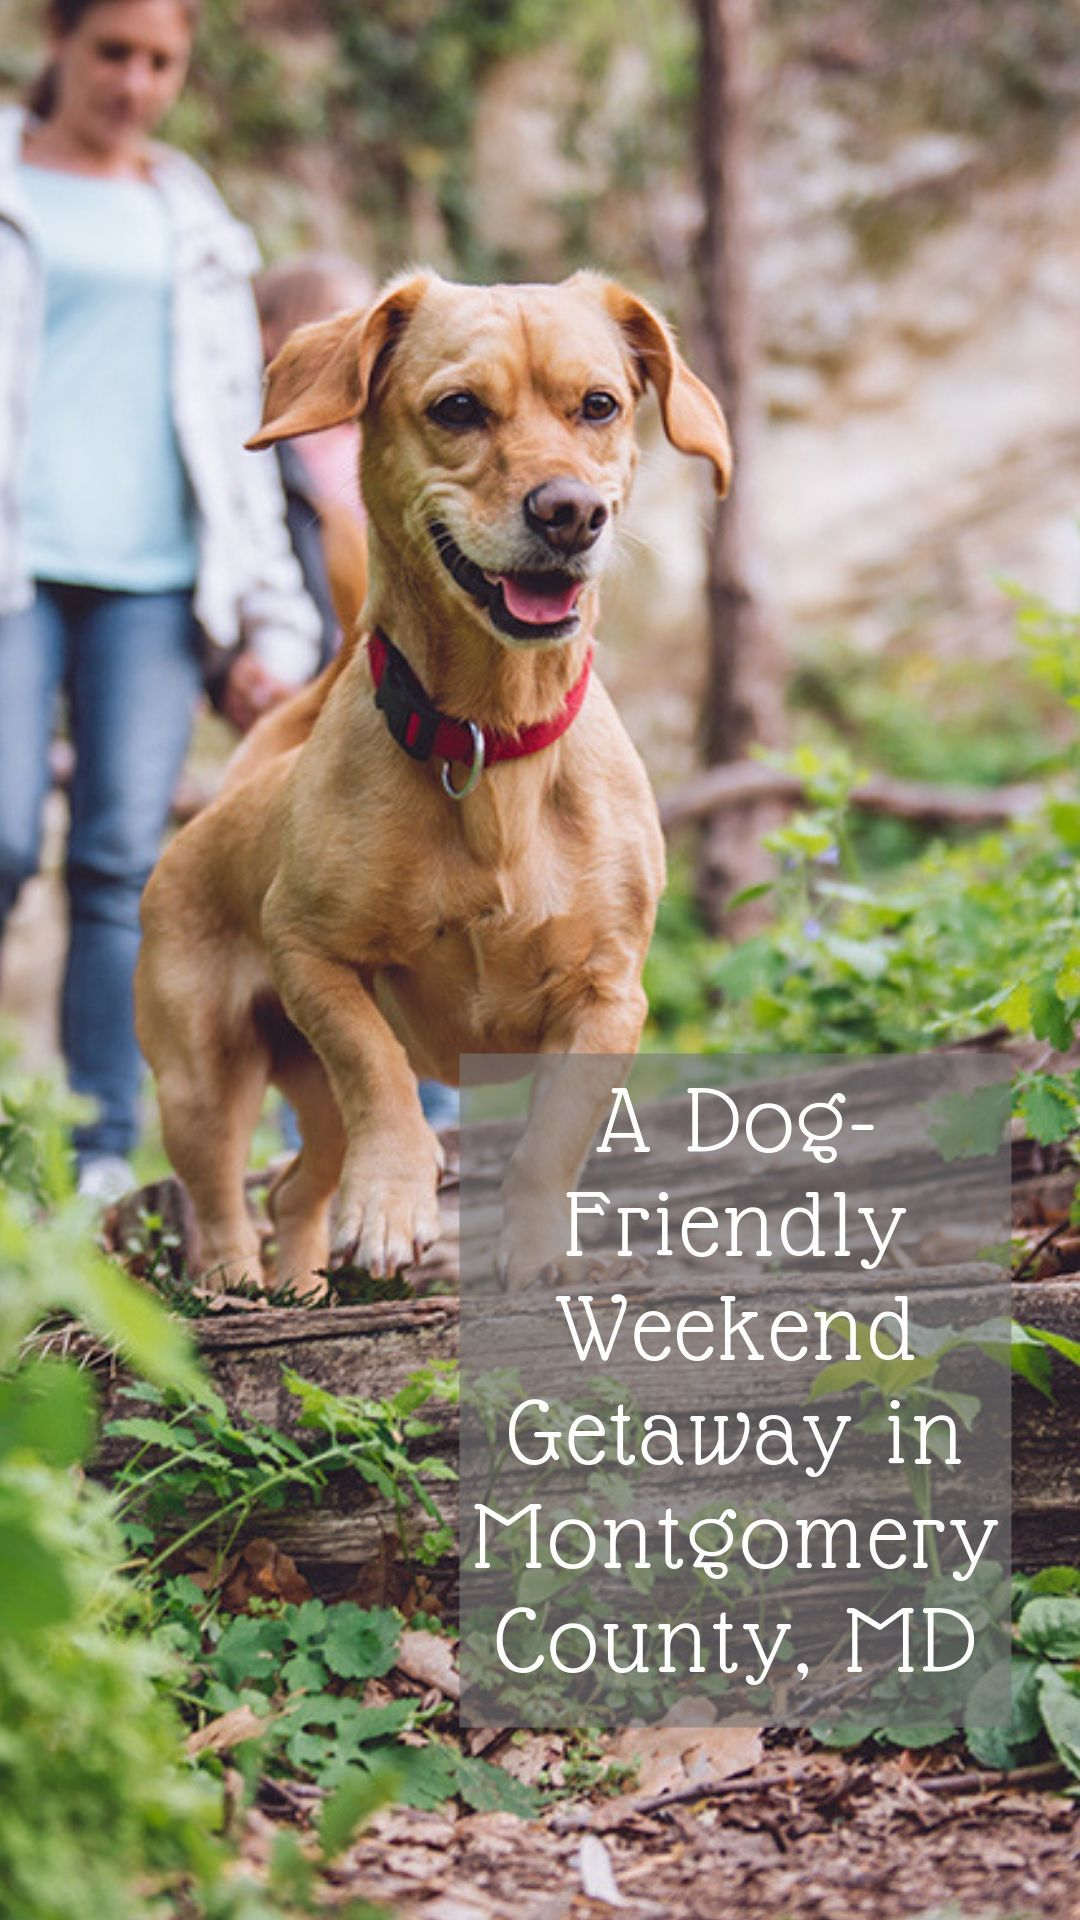 A Dog Friendly Weekend Getaway Dog Friends Dogs Weekend Getaways